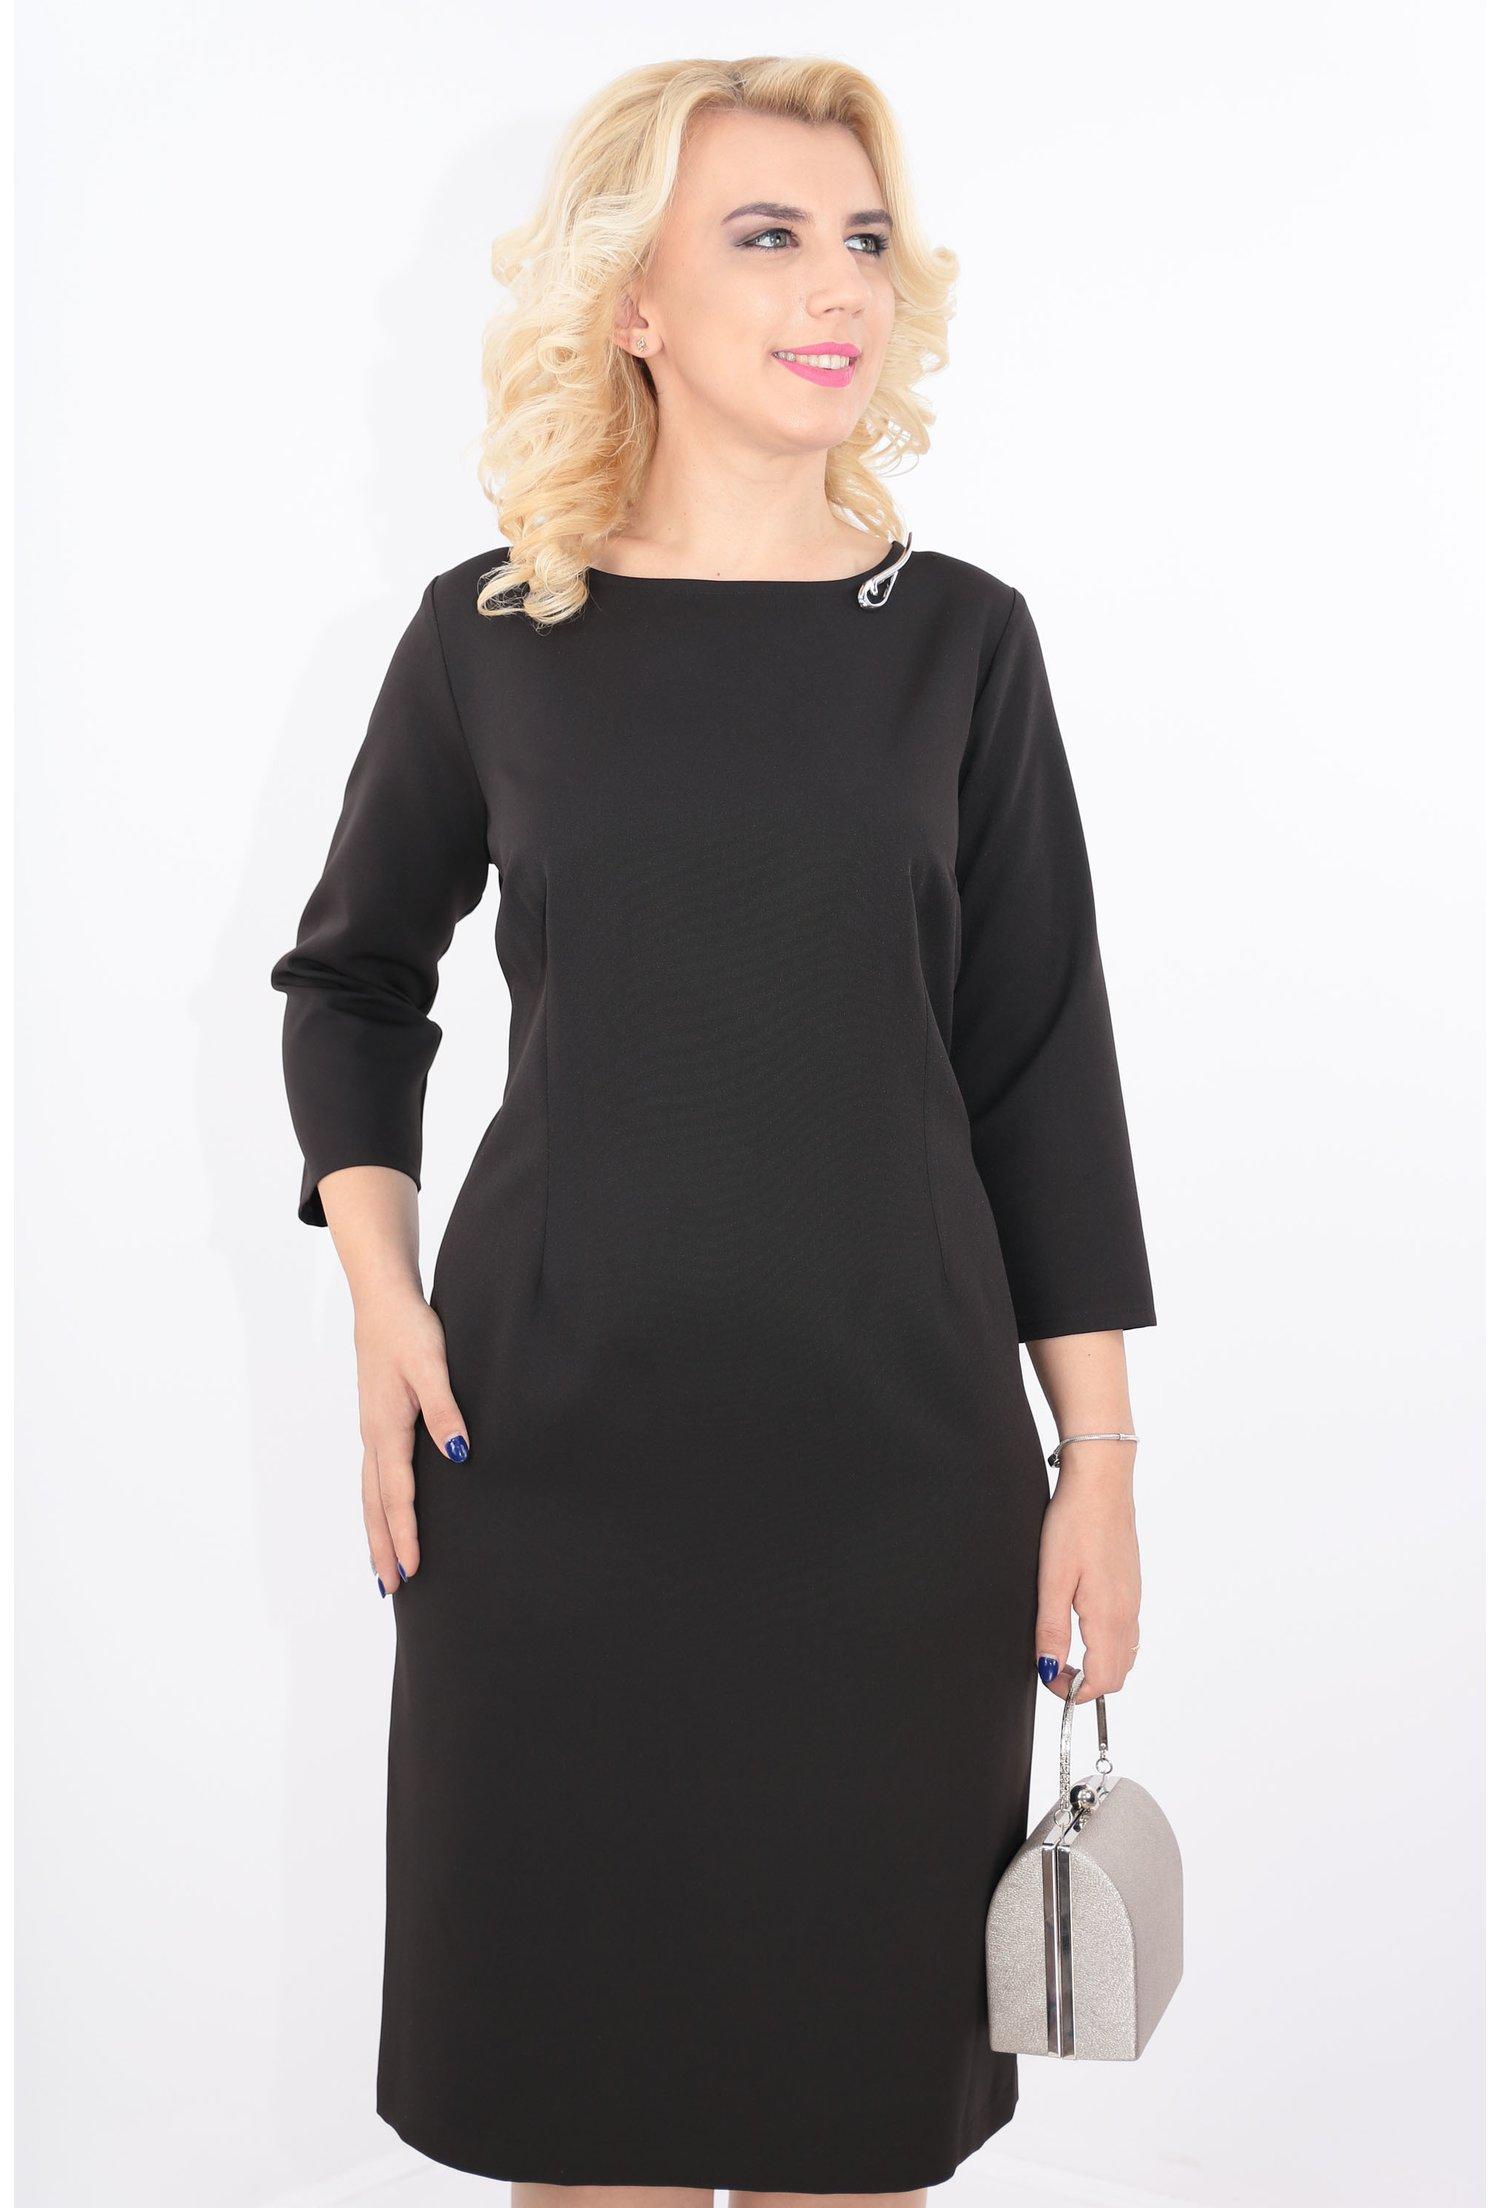 Rochie eleganta neagra cu brosa argintie